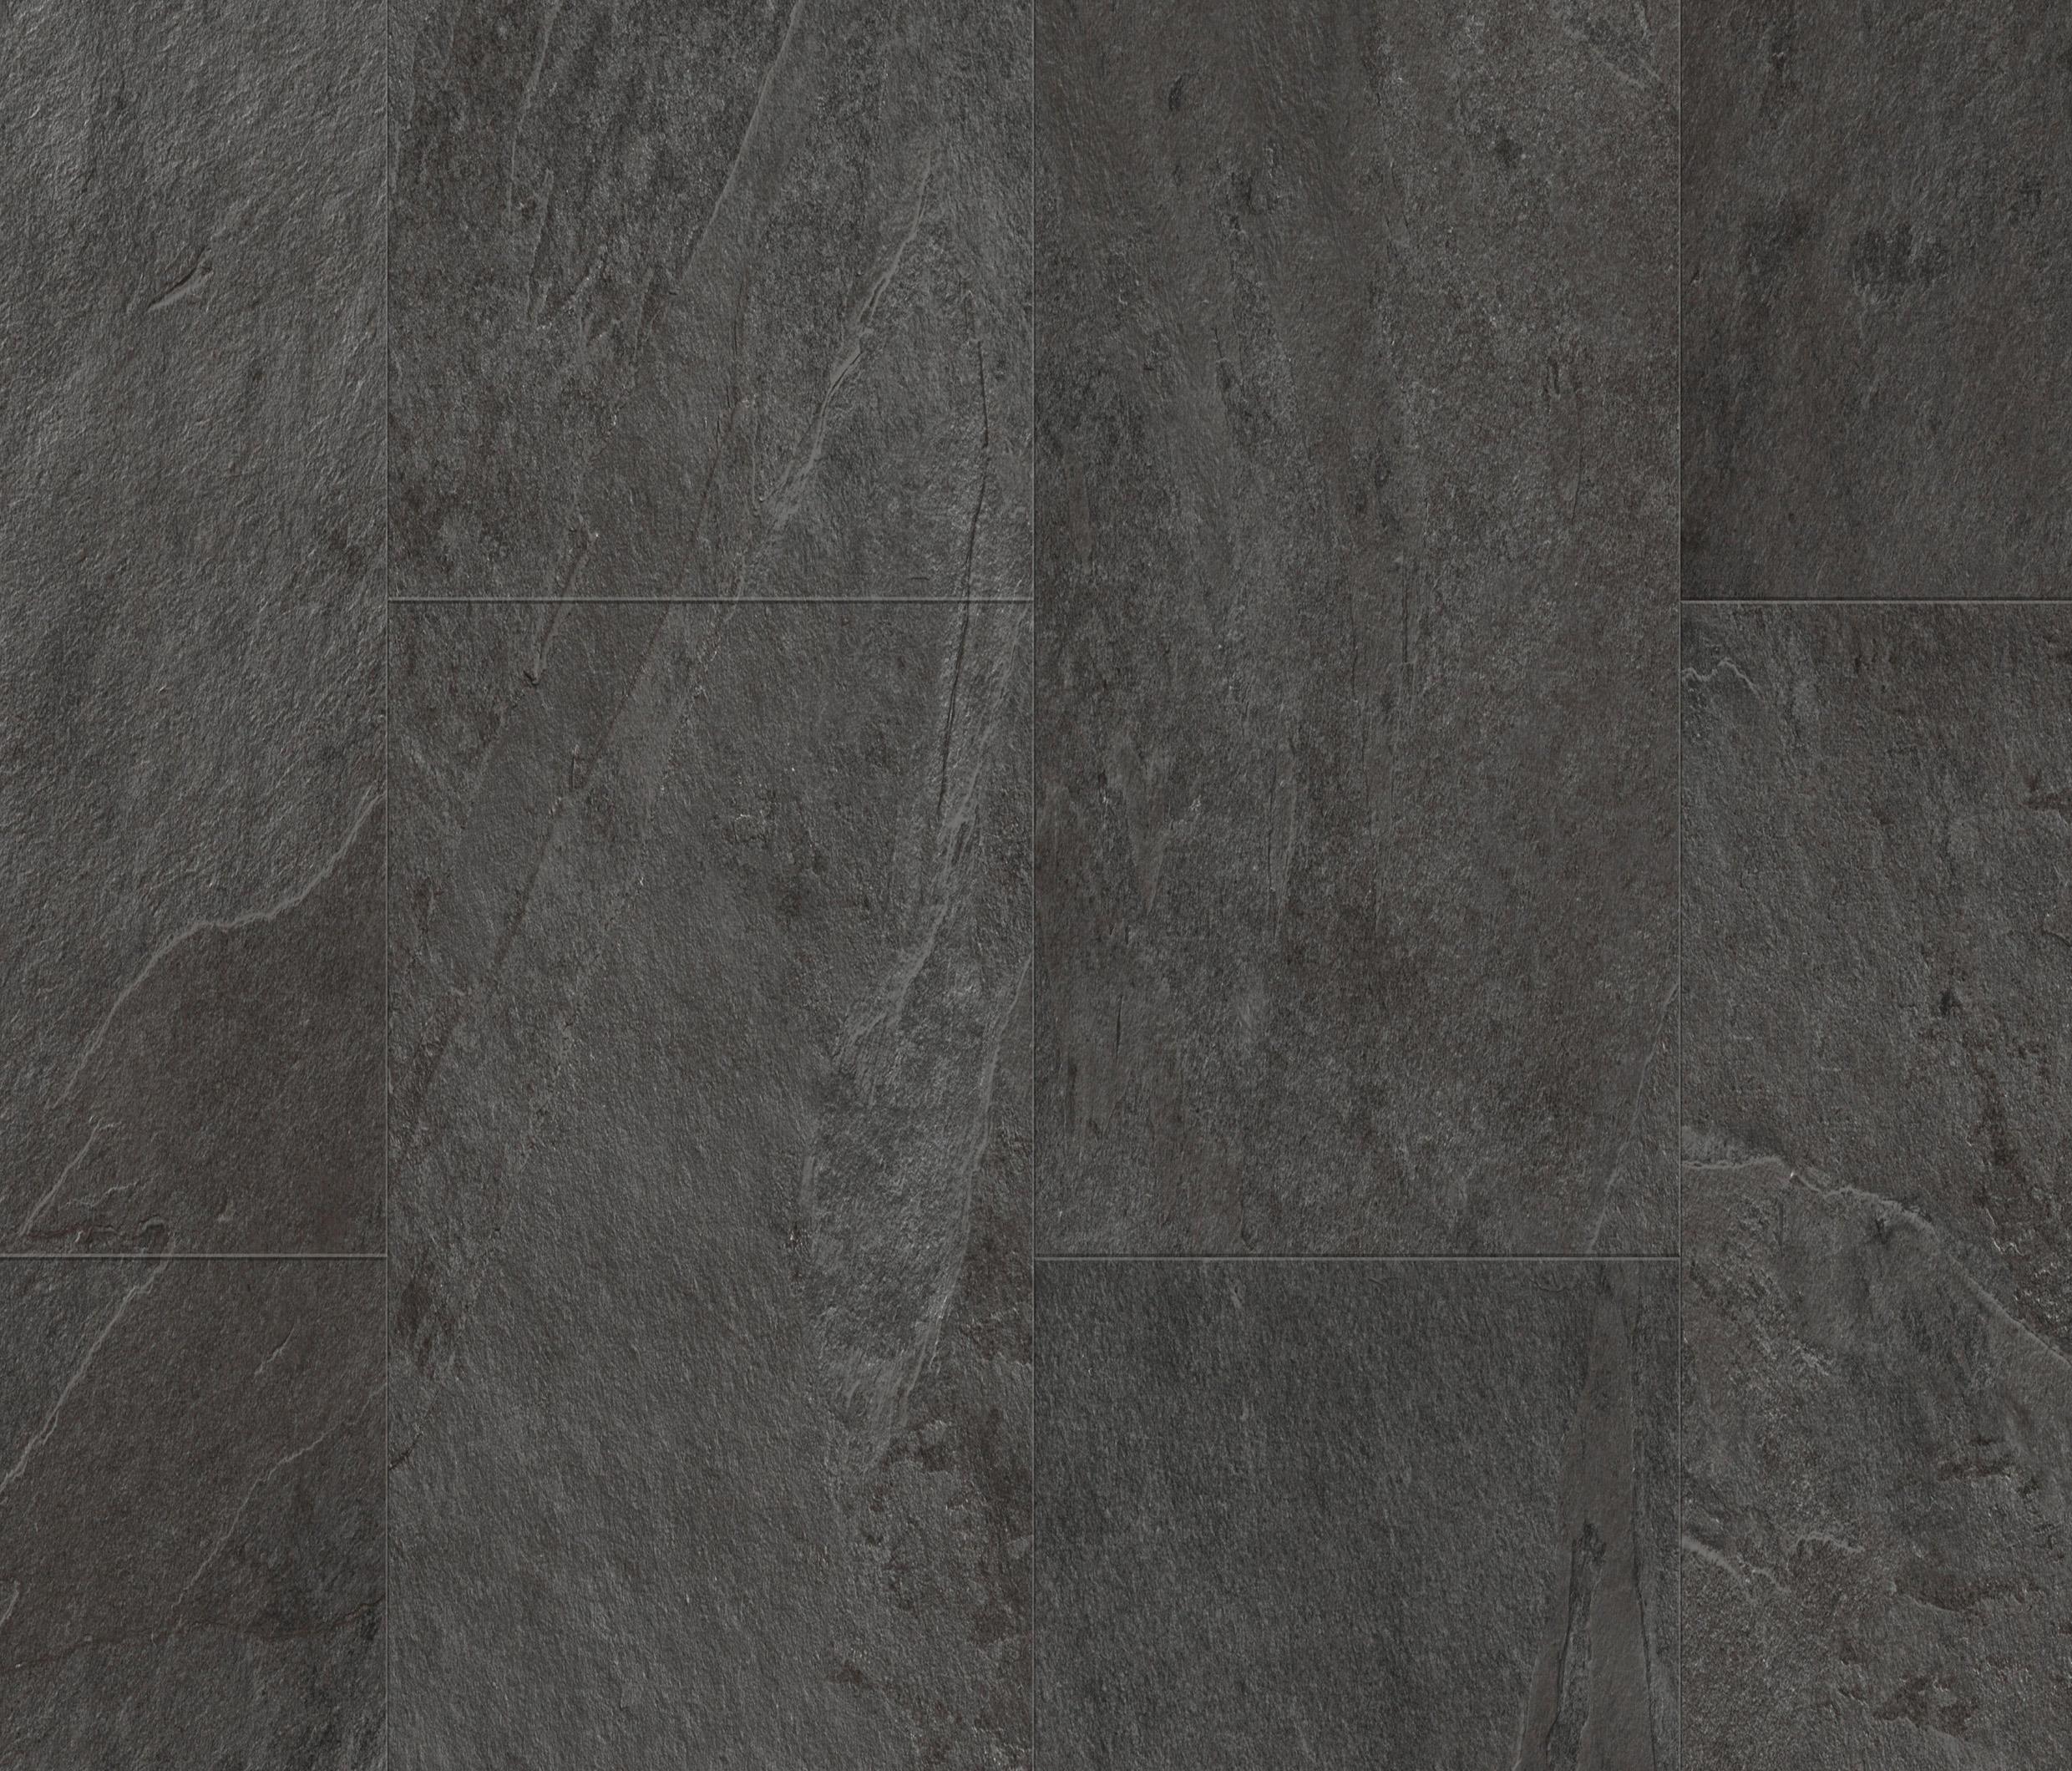 Tile Black Scivaro Slate Laminate Flooring From Pergo